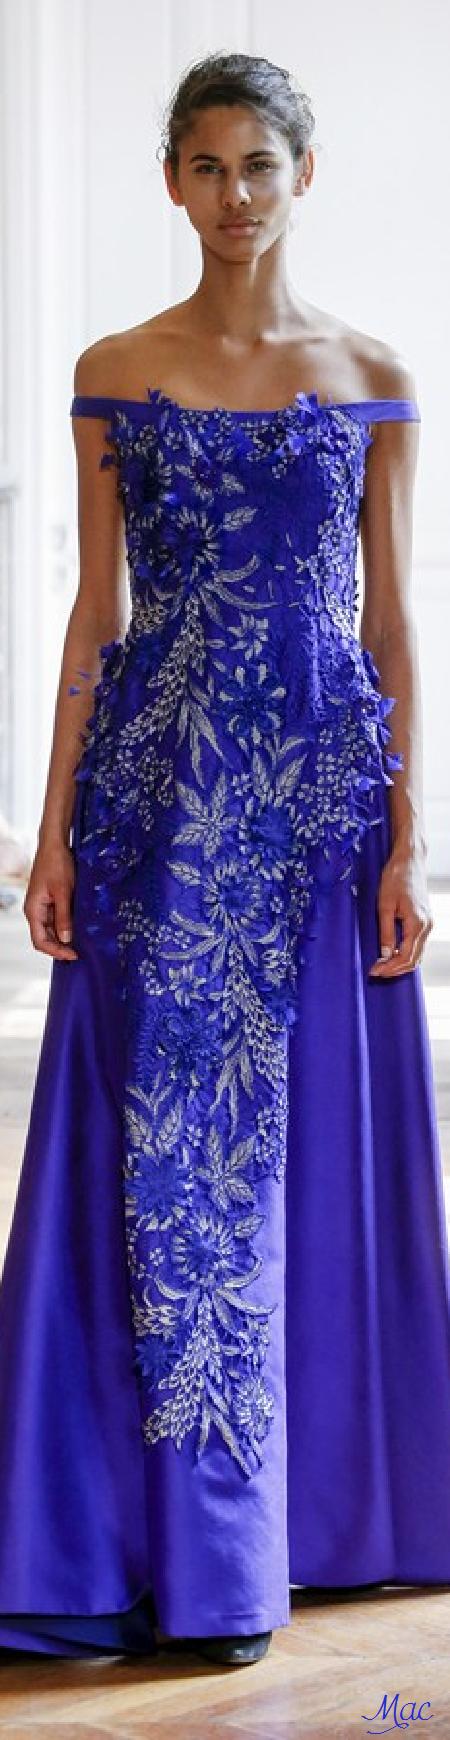 Fall 2015 Couture Busardi | Vestido coctel | Pinterest | Azul, Amar ...